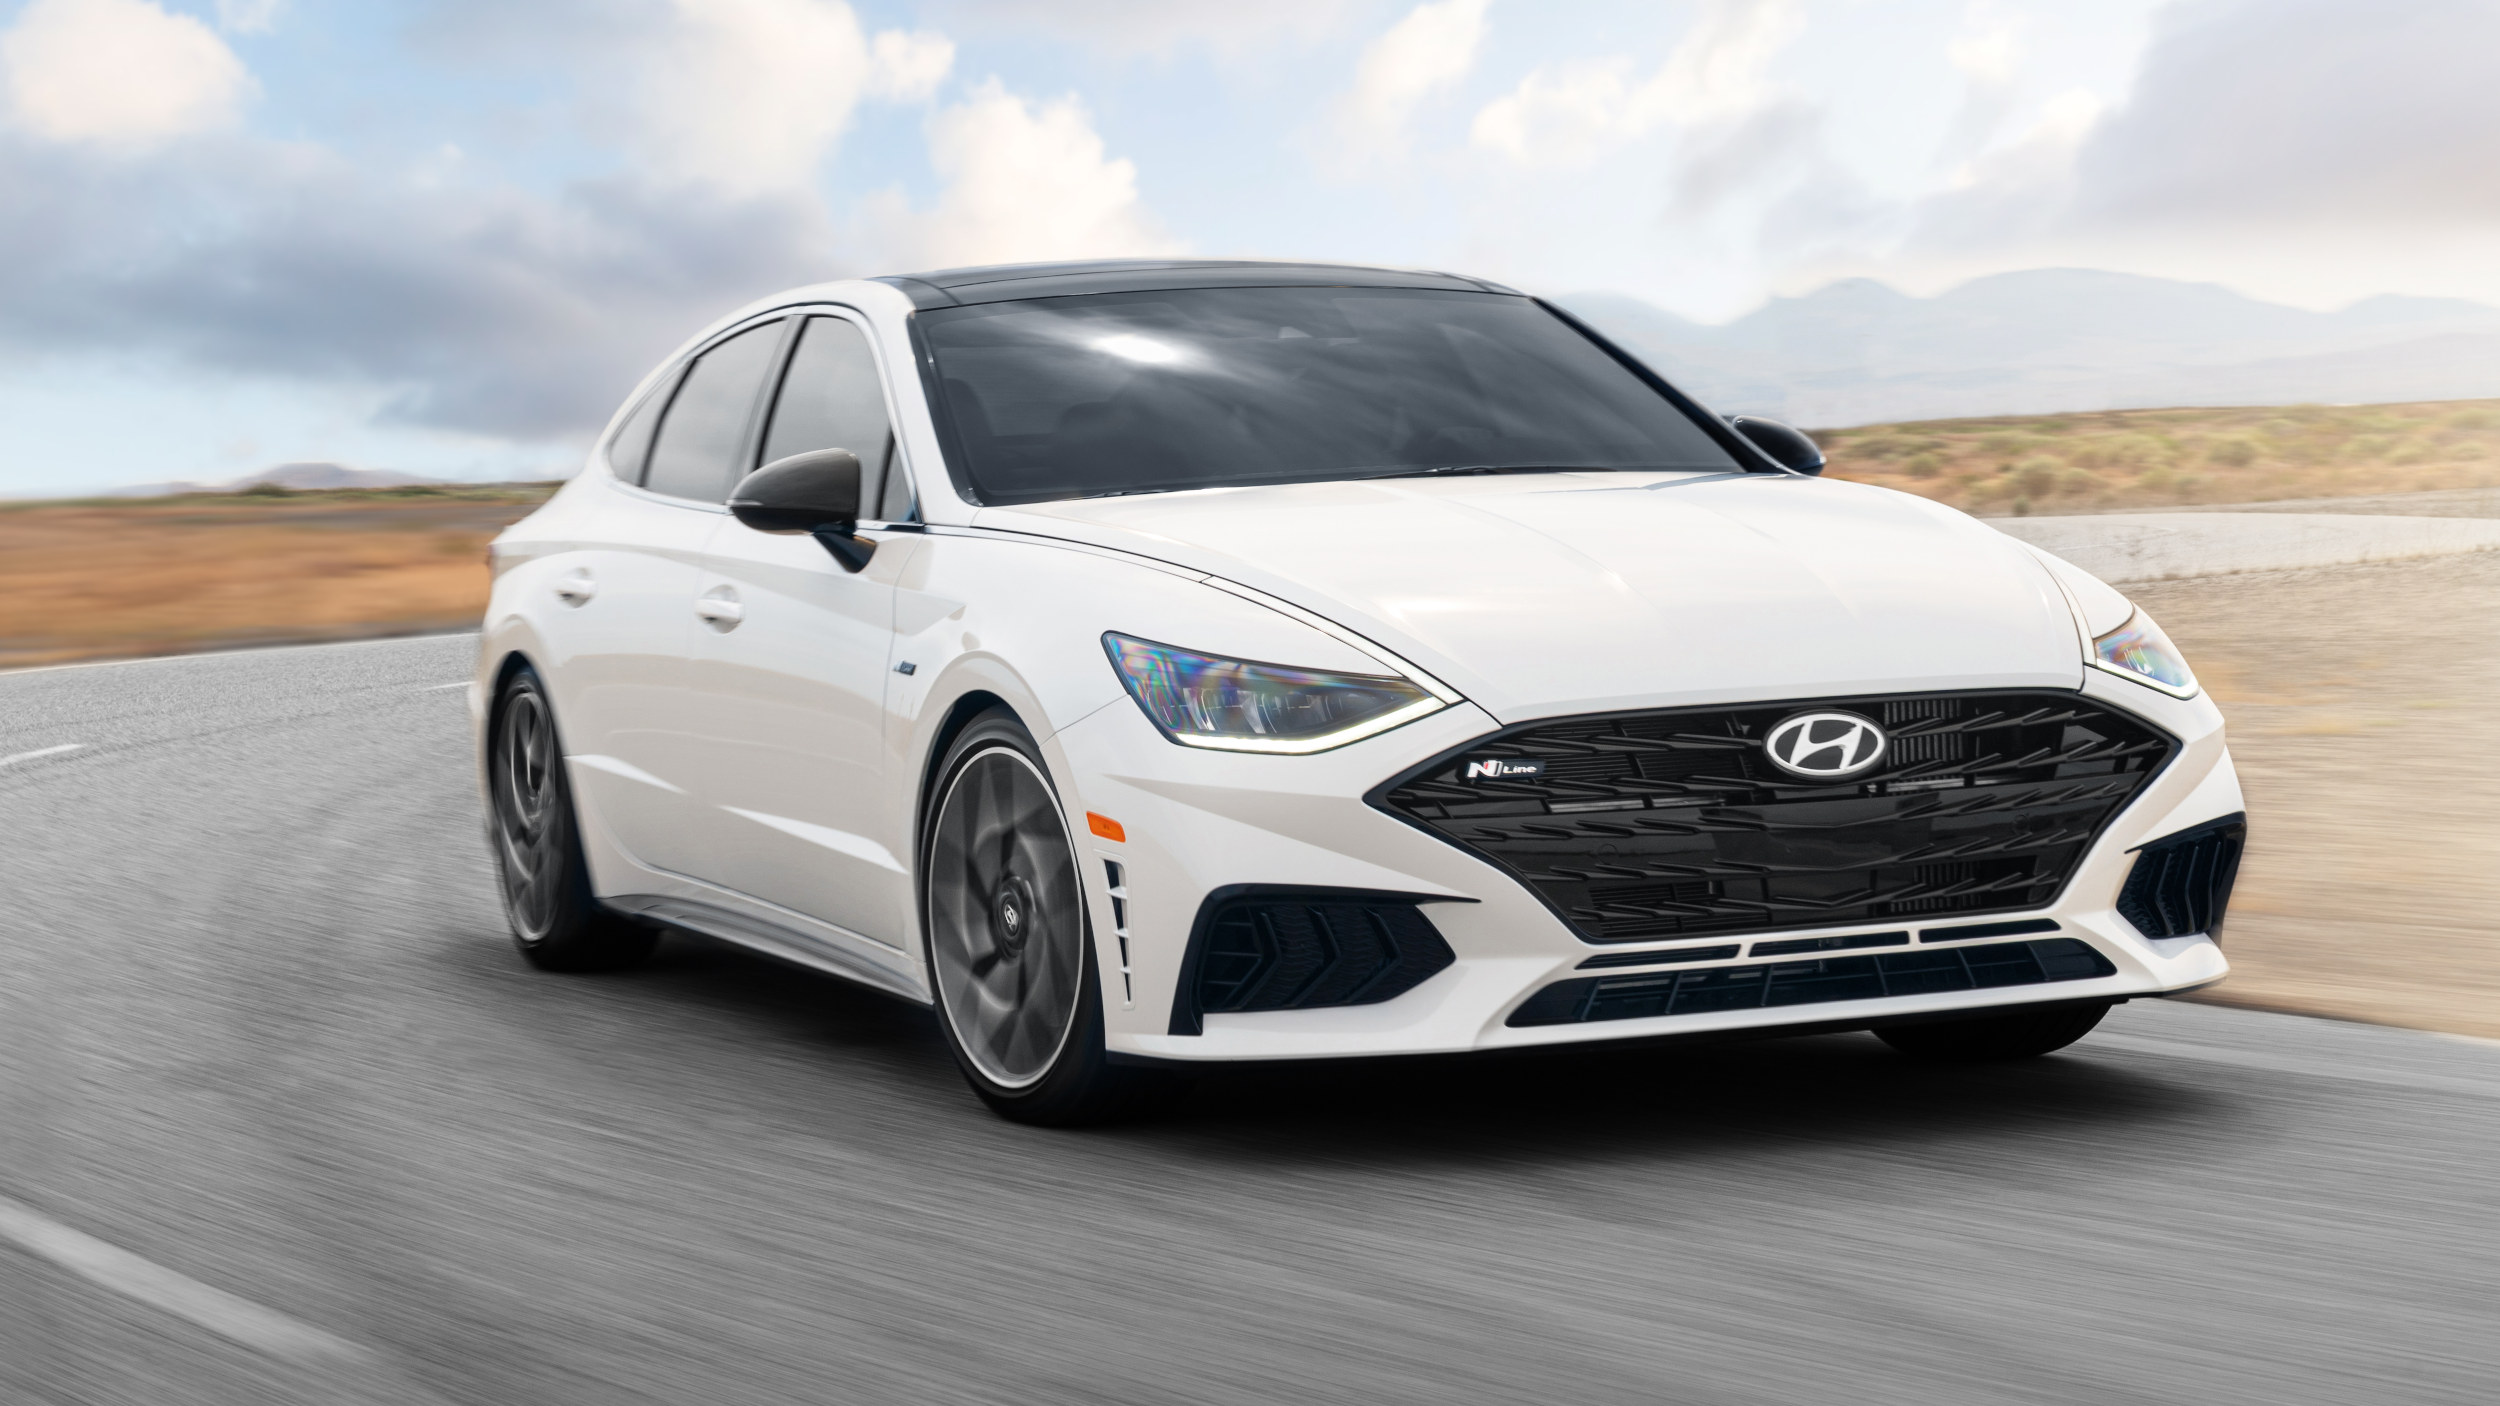 2021 Hyundai Sonata N Line: Specs, Prices, Features, Launch